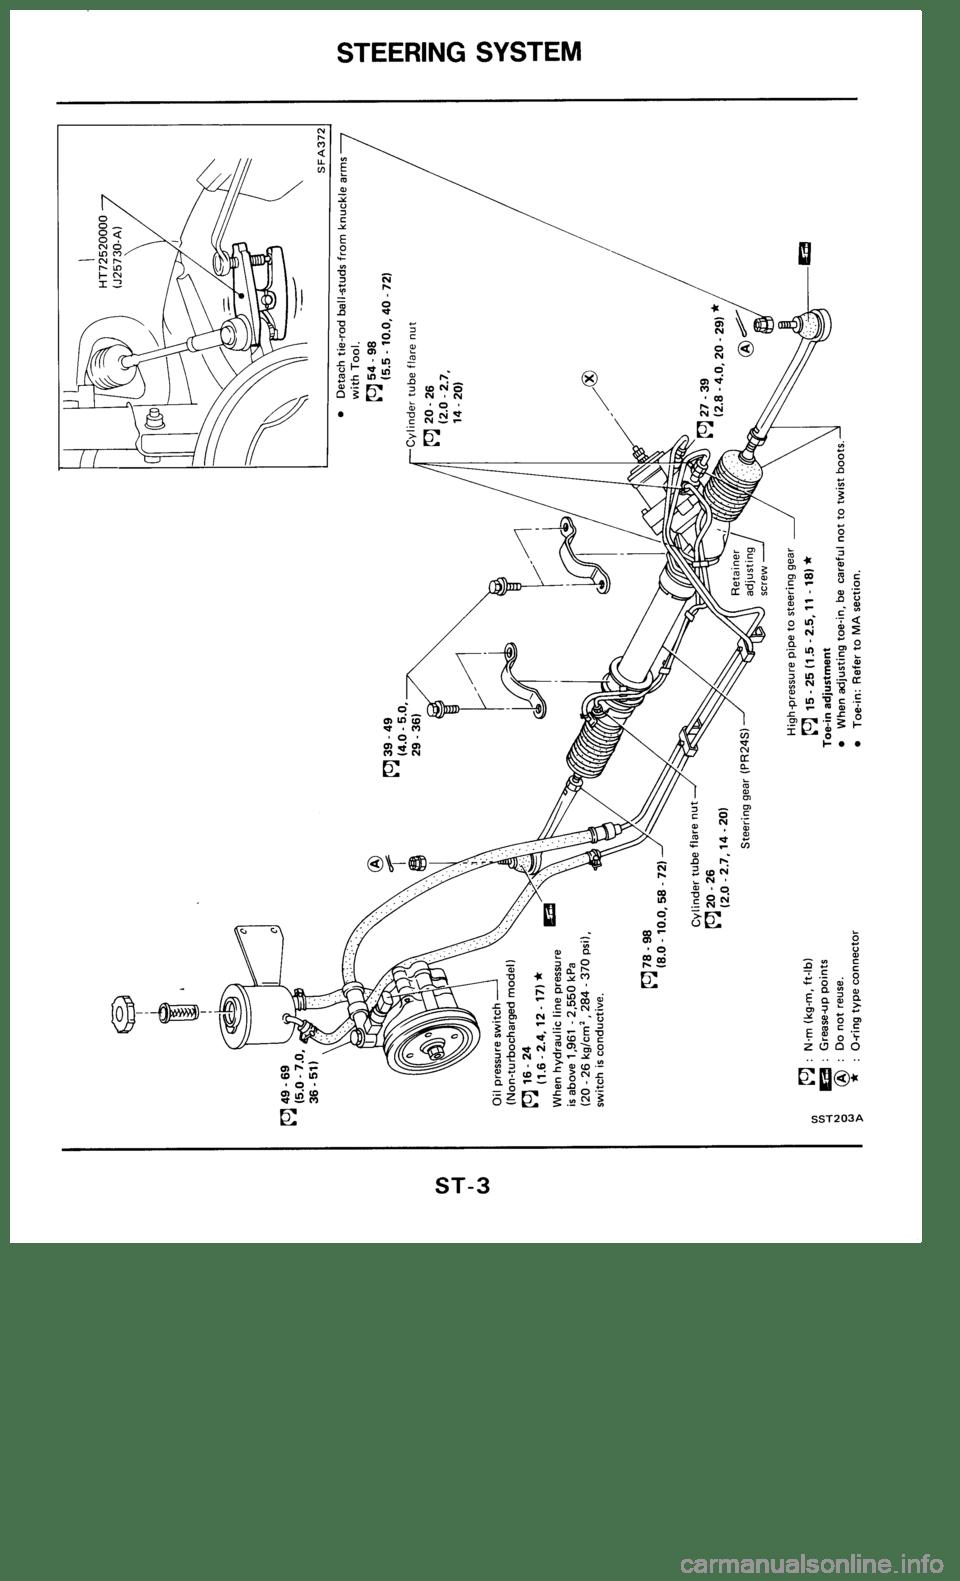 NISSAN 300ZX 1985 Z31 Steering System Workshop Manual